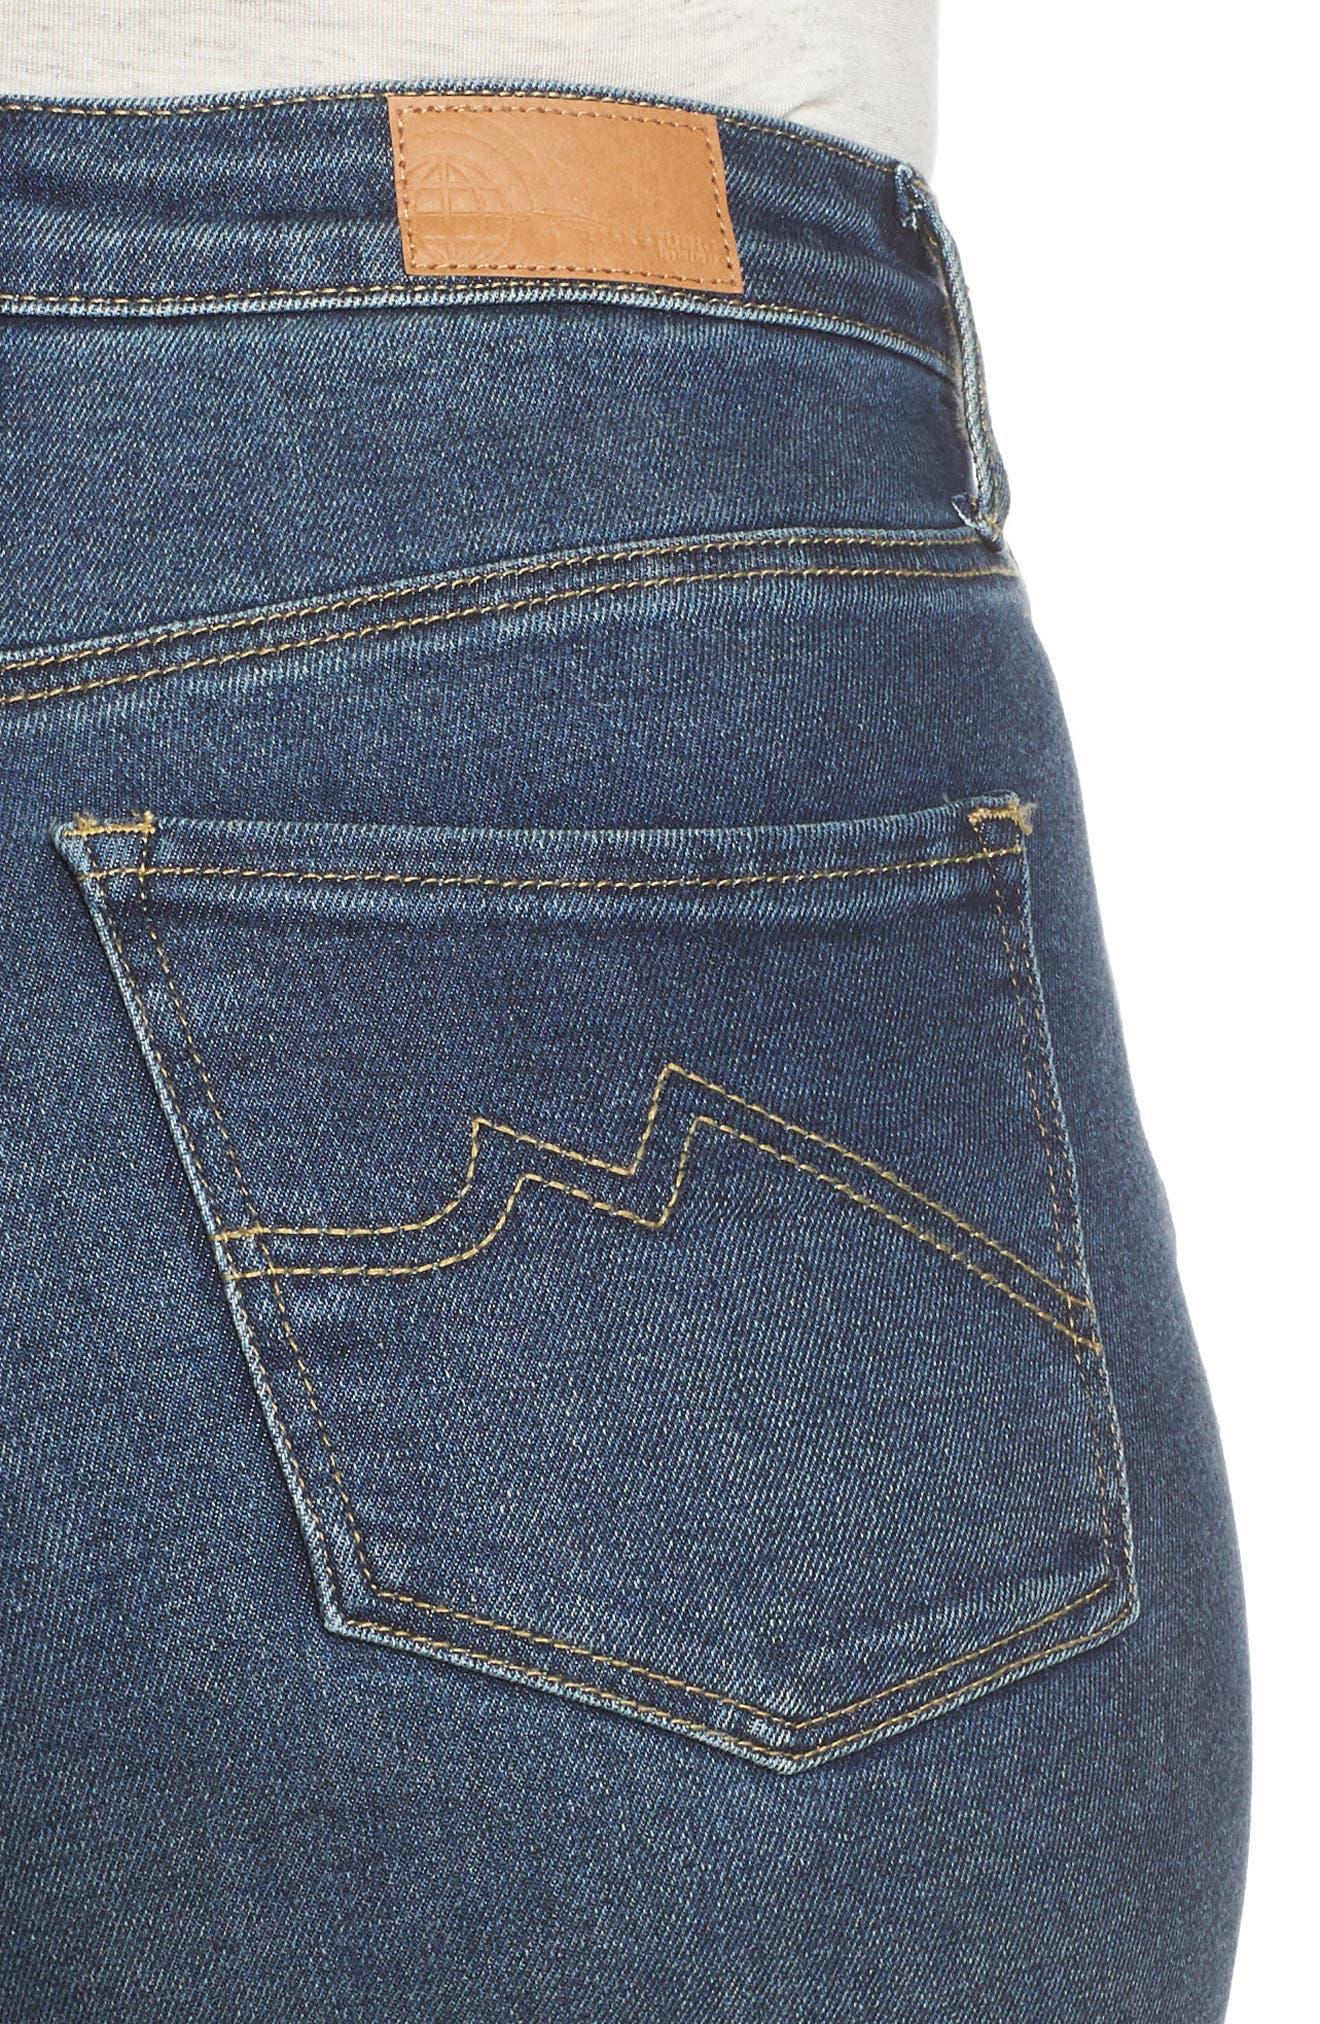 MAXSTUDIO INDIGO, High Waist Crop Skinny Jeans, Alternate thumbnail 5, color, JADE